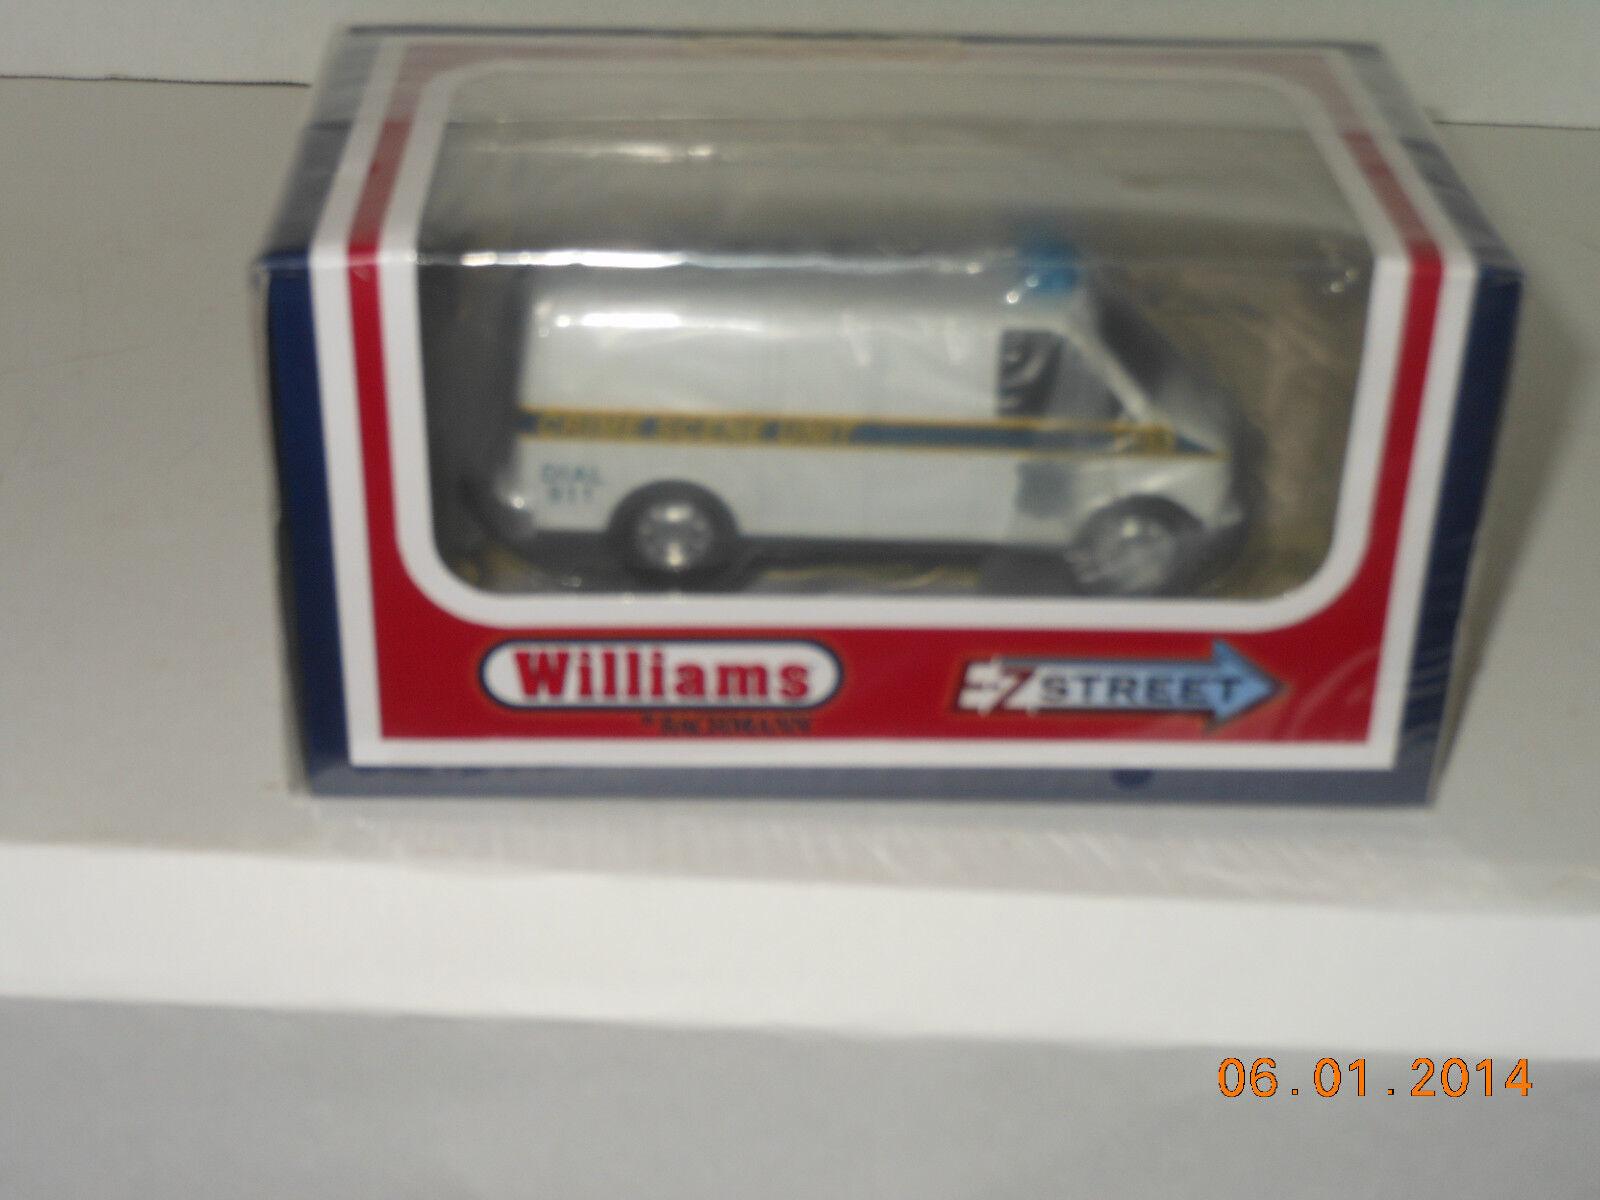 Williams/Bachmann  42724 Motorized EZ Street Vehicle Police Van  superstreets